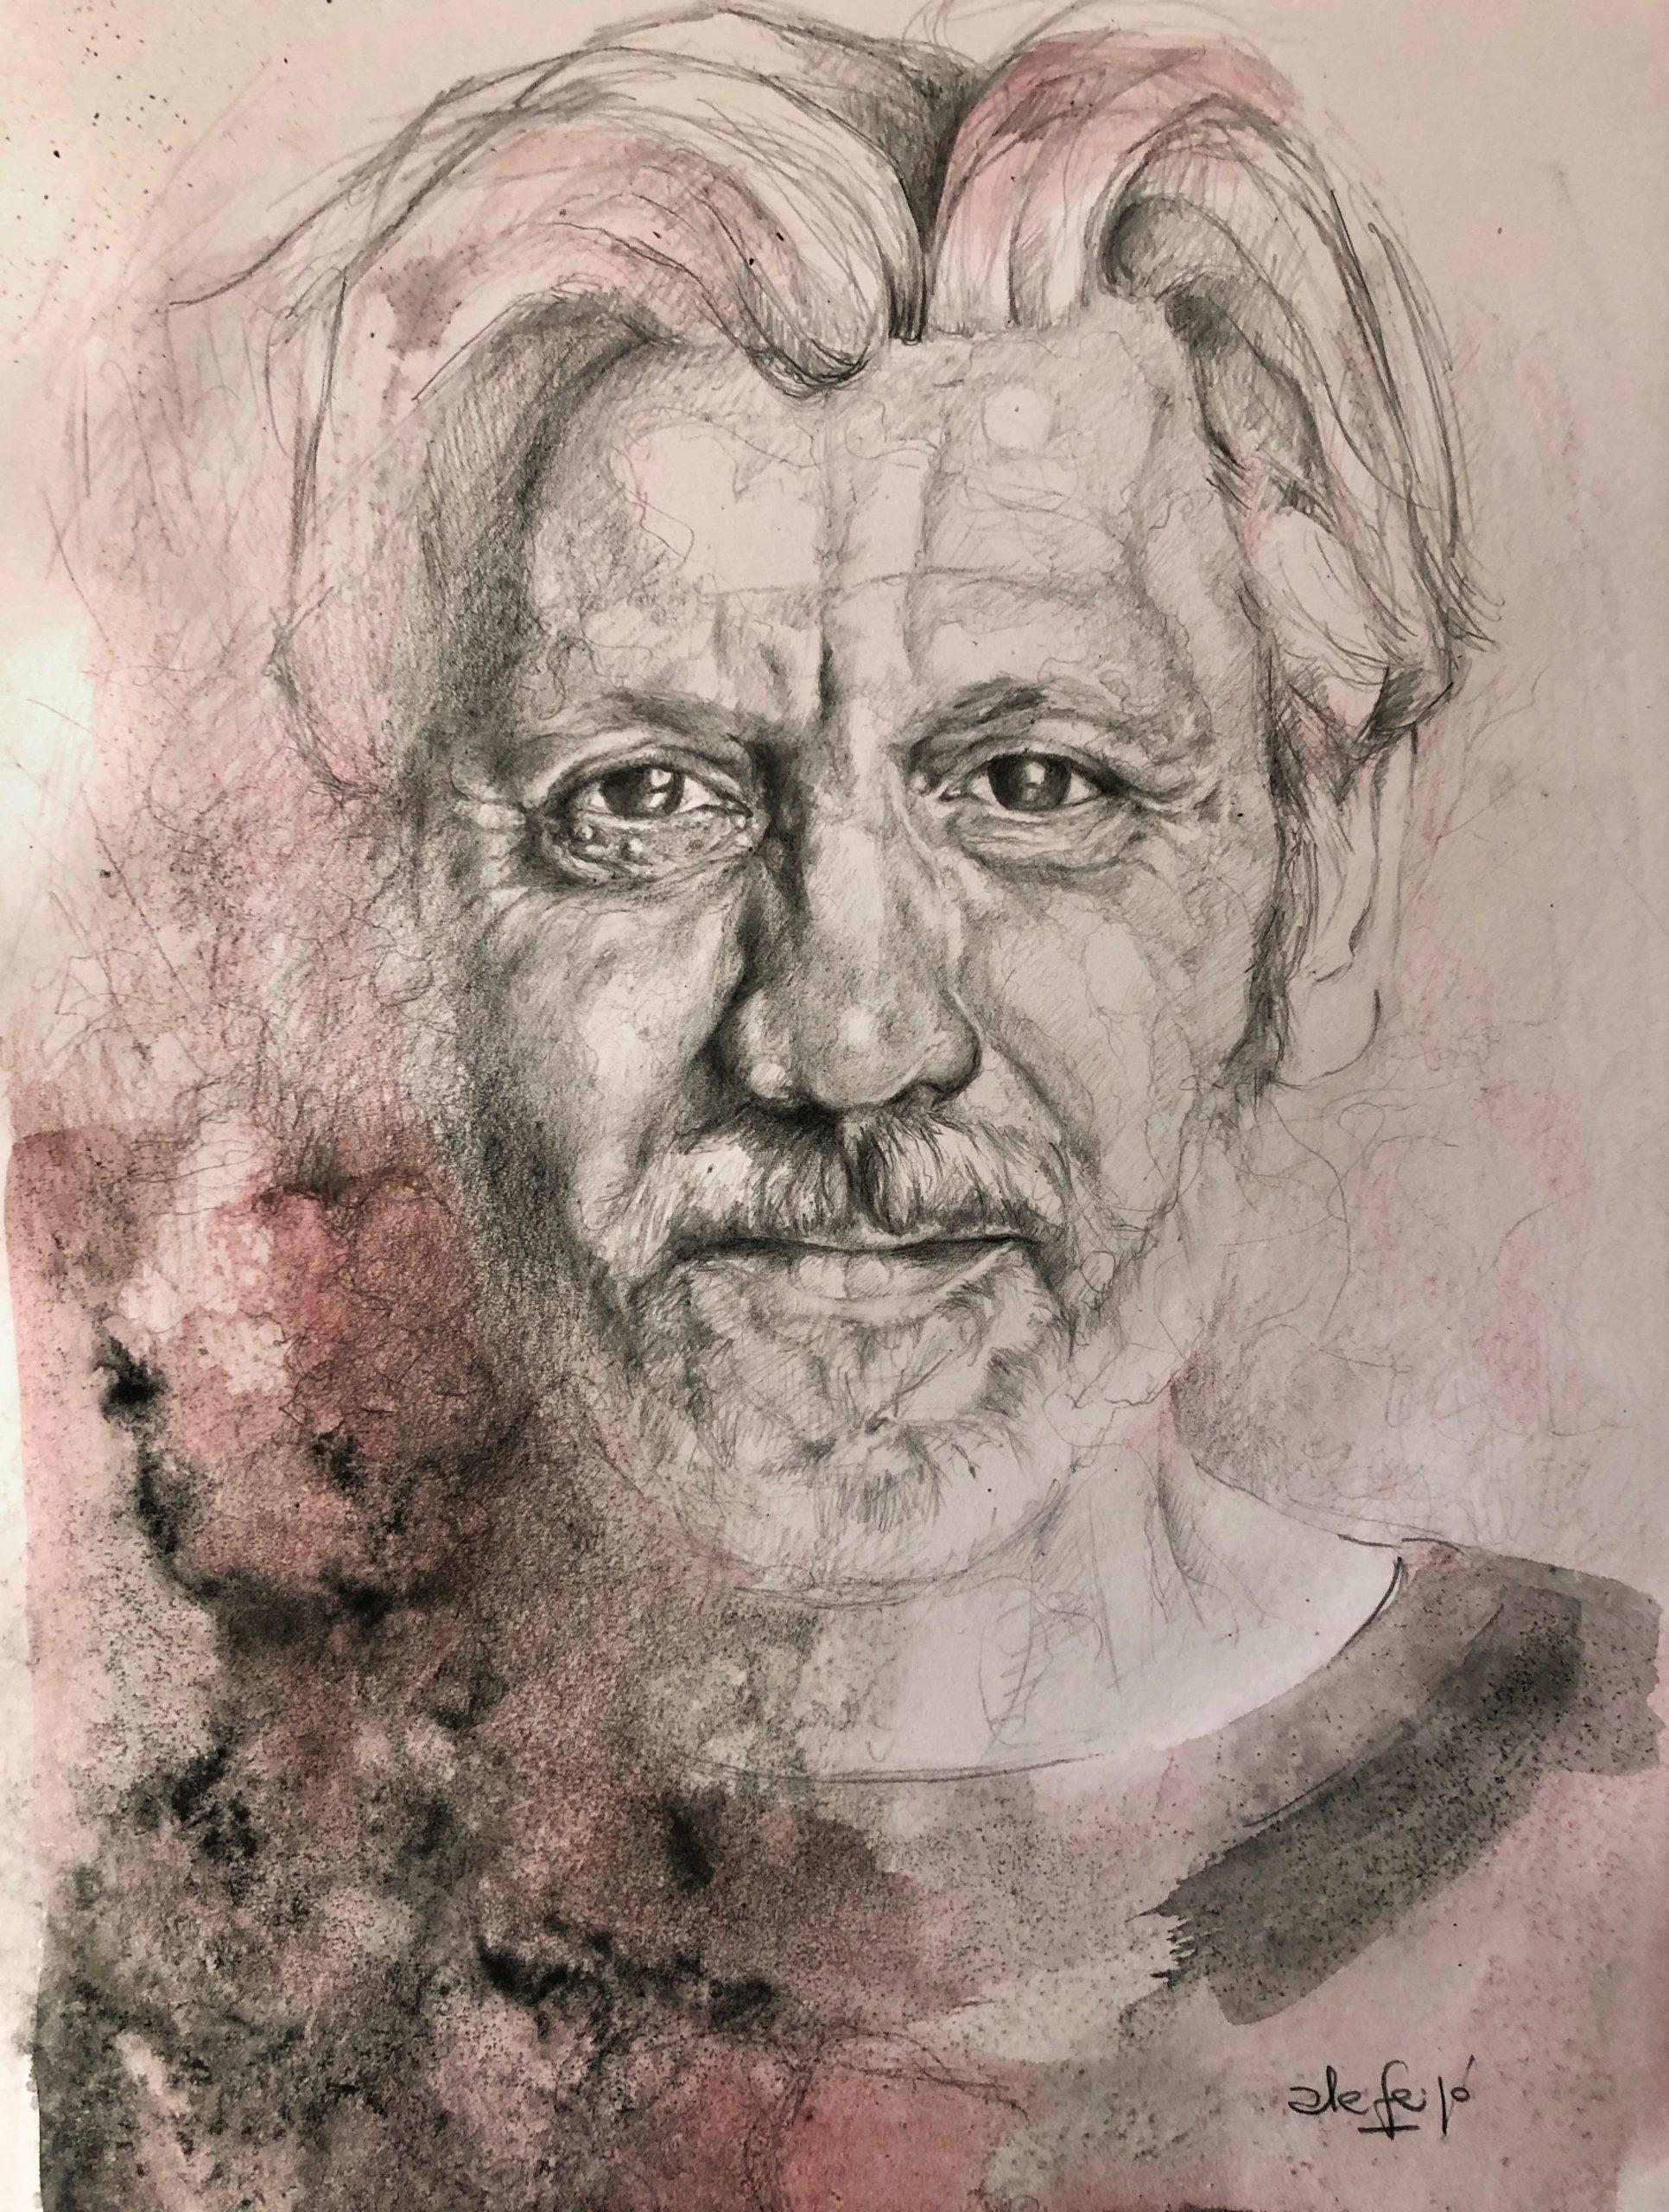 Ale Feijó | Serie Retratos. Araldi. Lápiz sobre papel. 21 x 29 cm